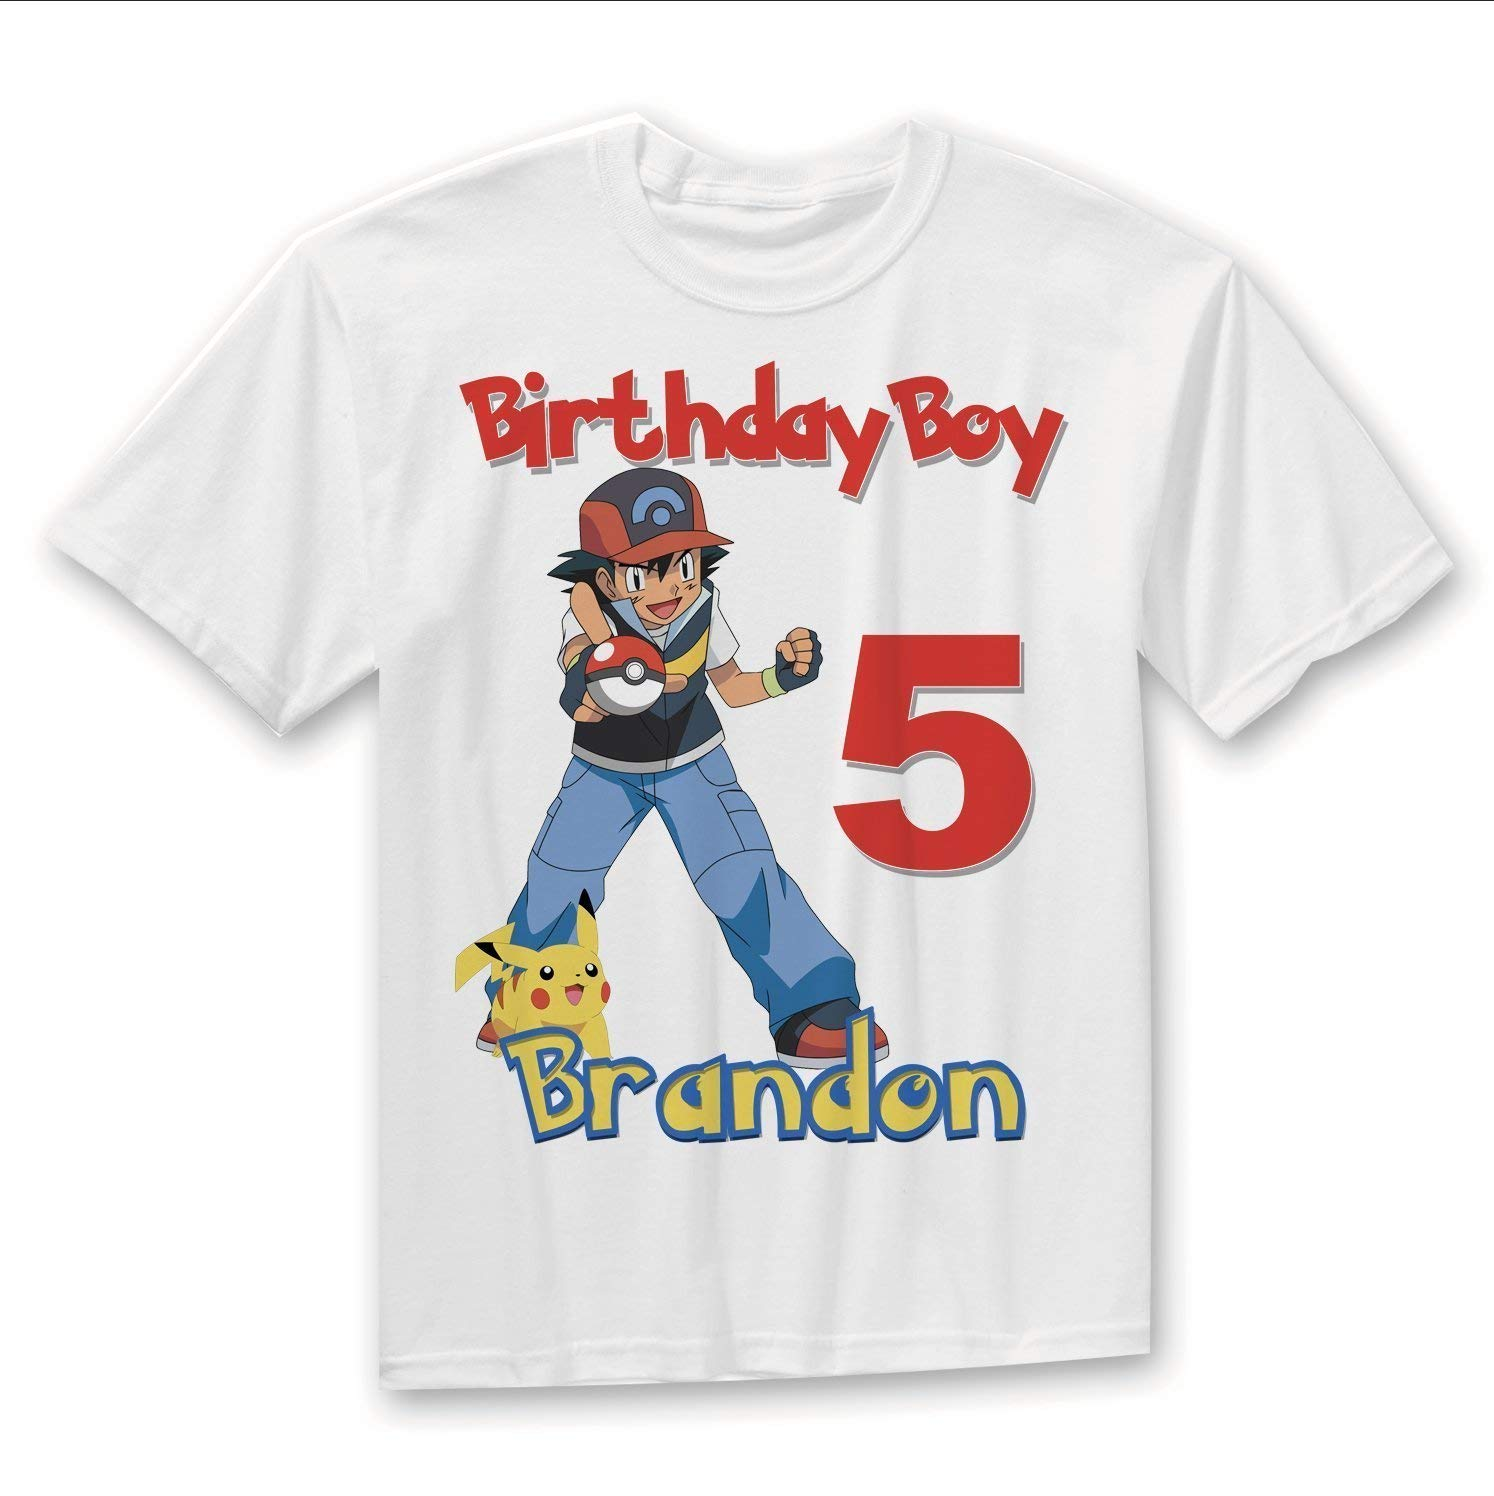 dda40a92 Get Quotations · Personalized Custom Pokemon Birthday shirt, Pokemon  Birthday shirt